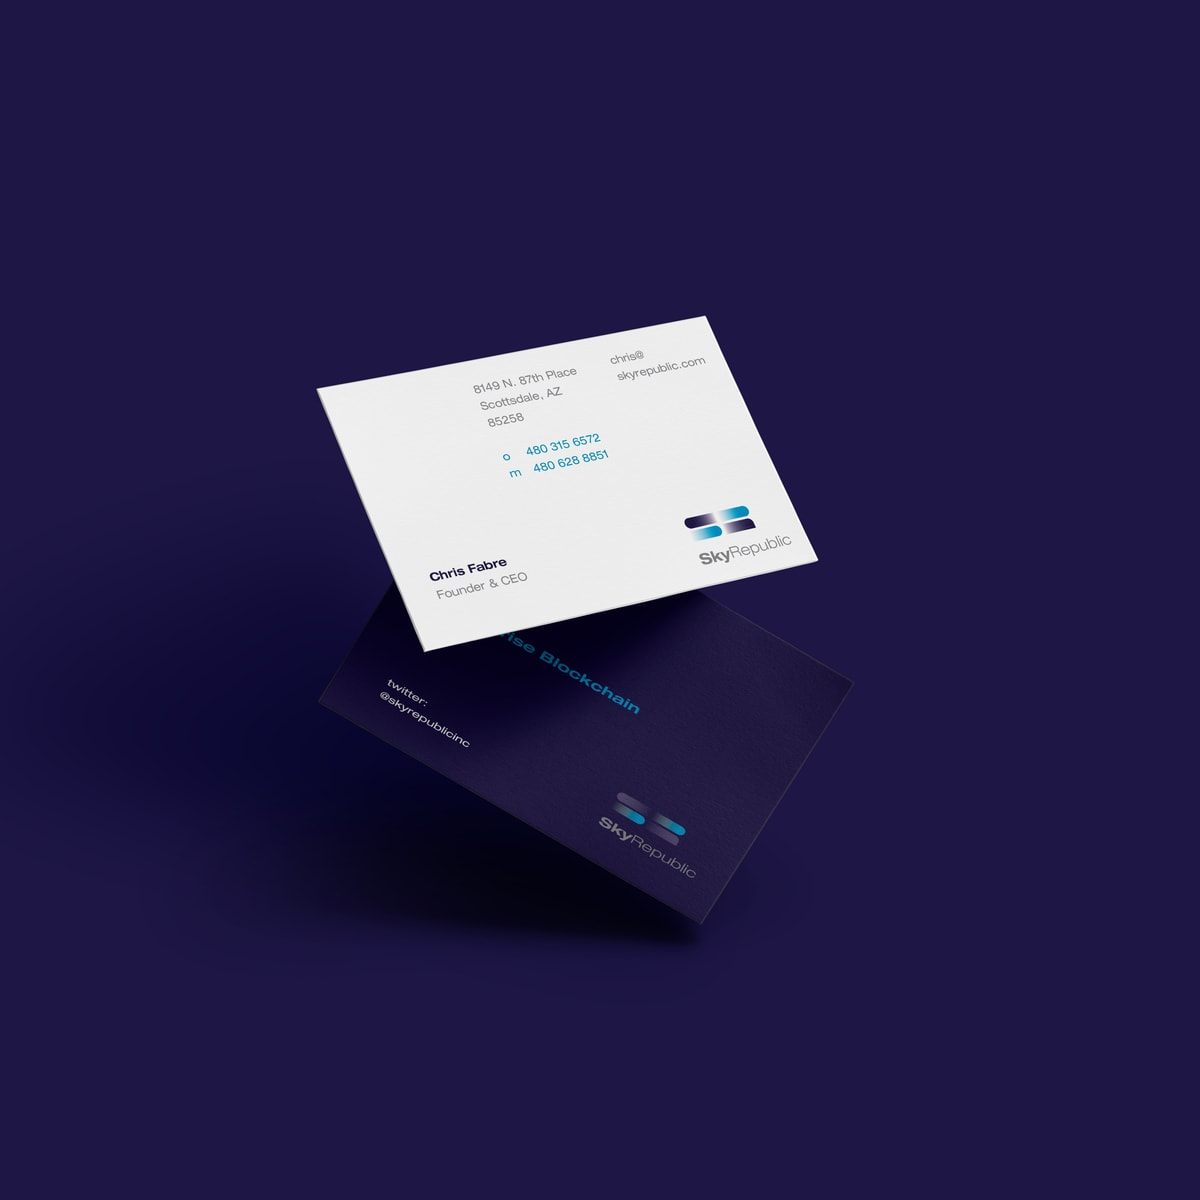 Startup branding element for Sky Republic - Business Card